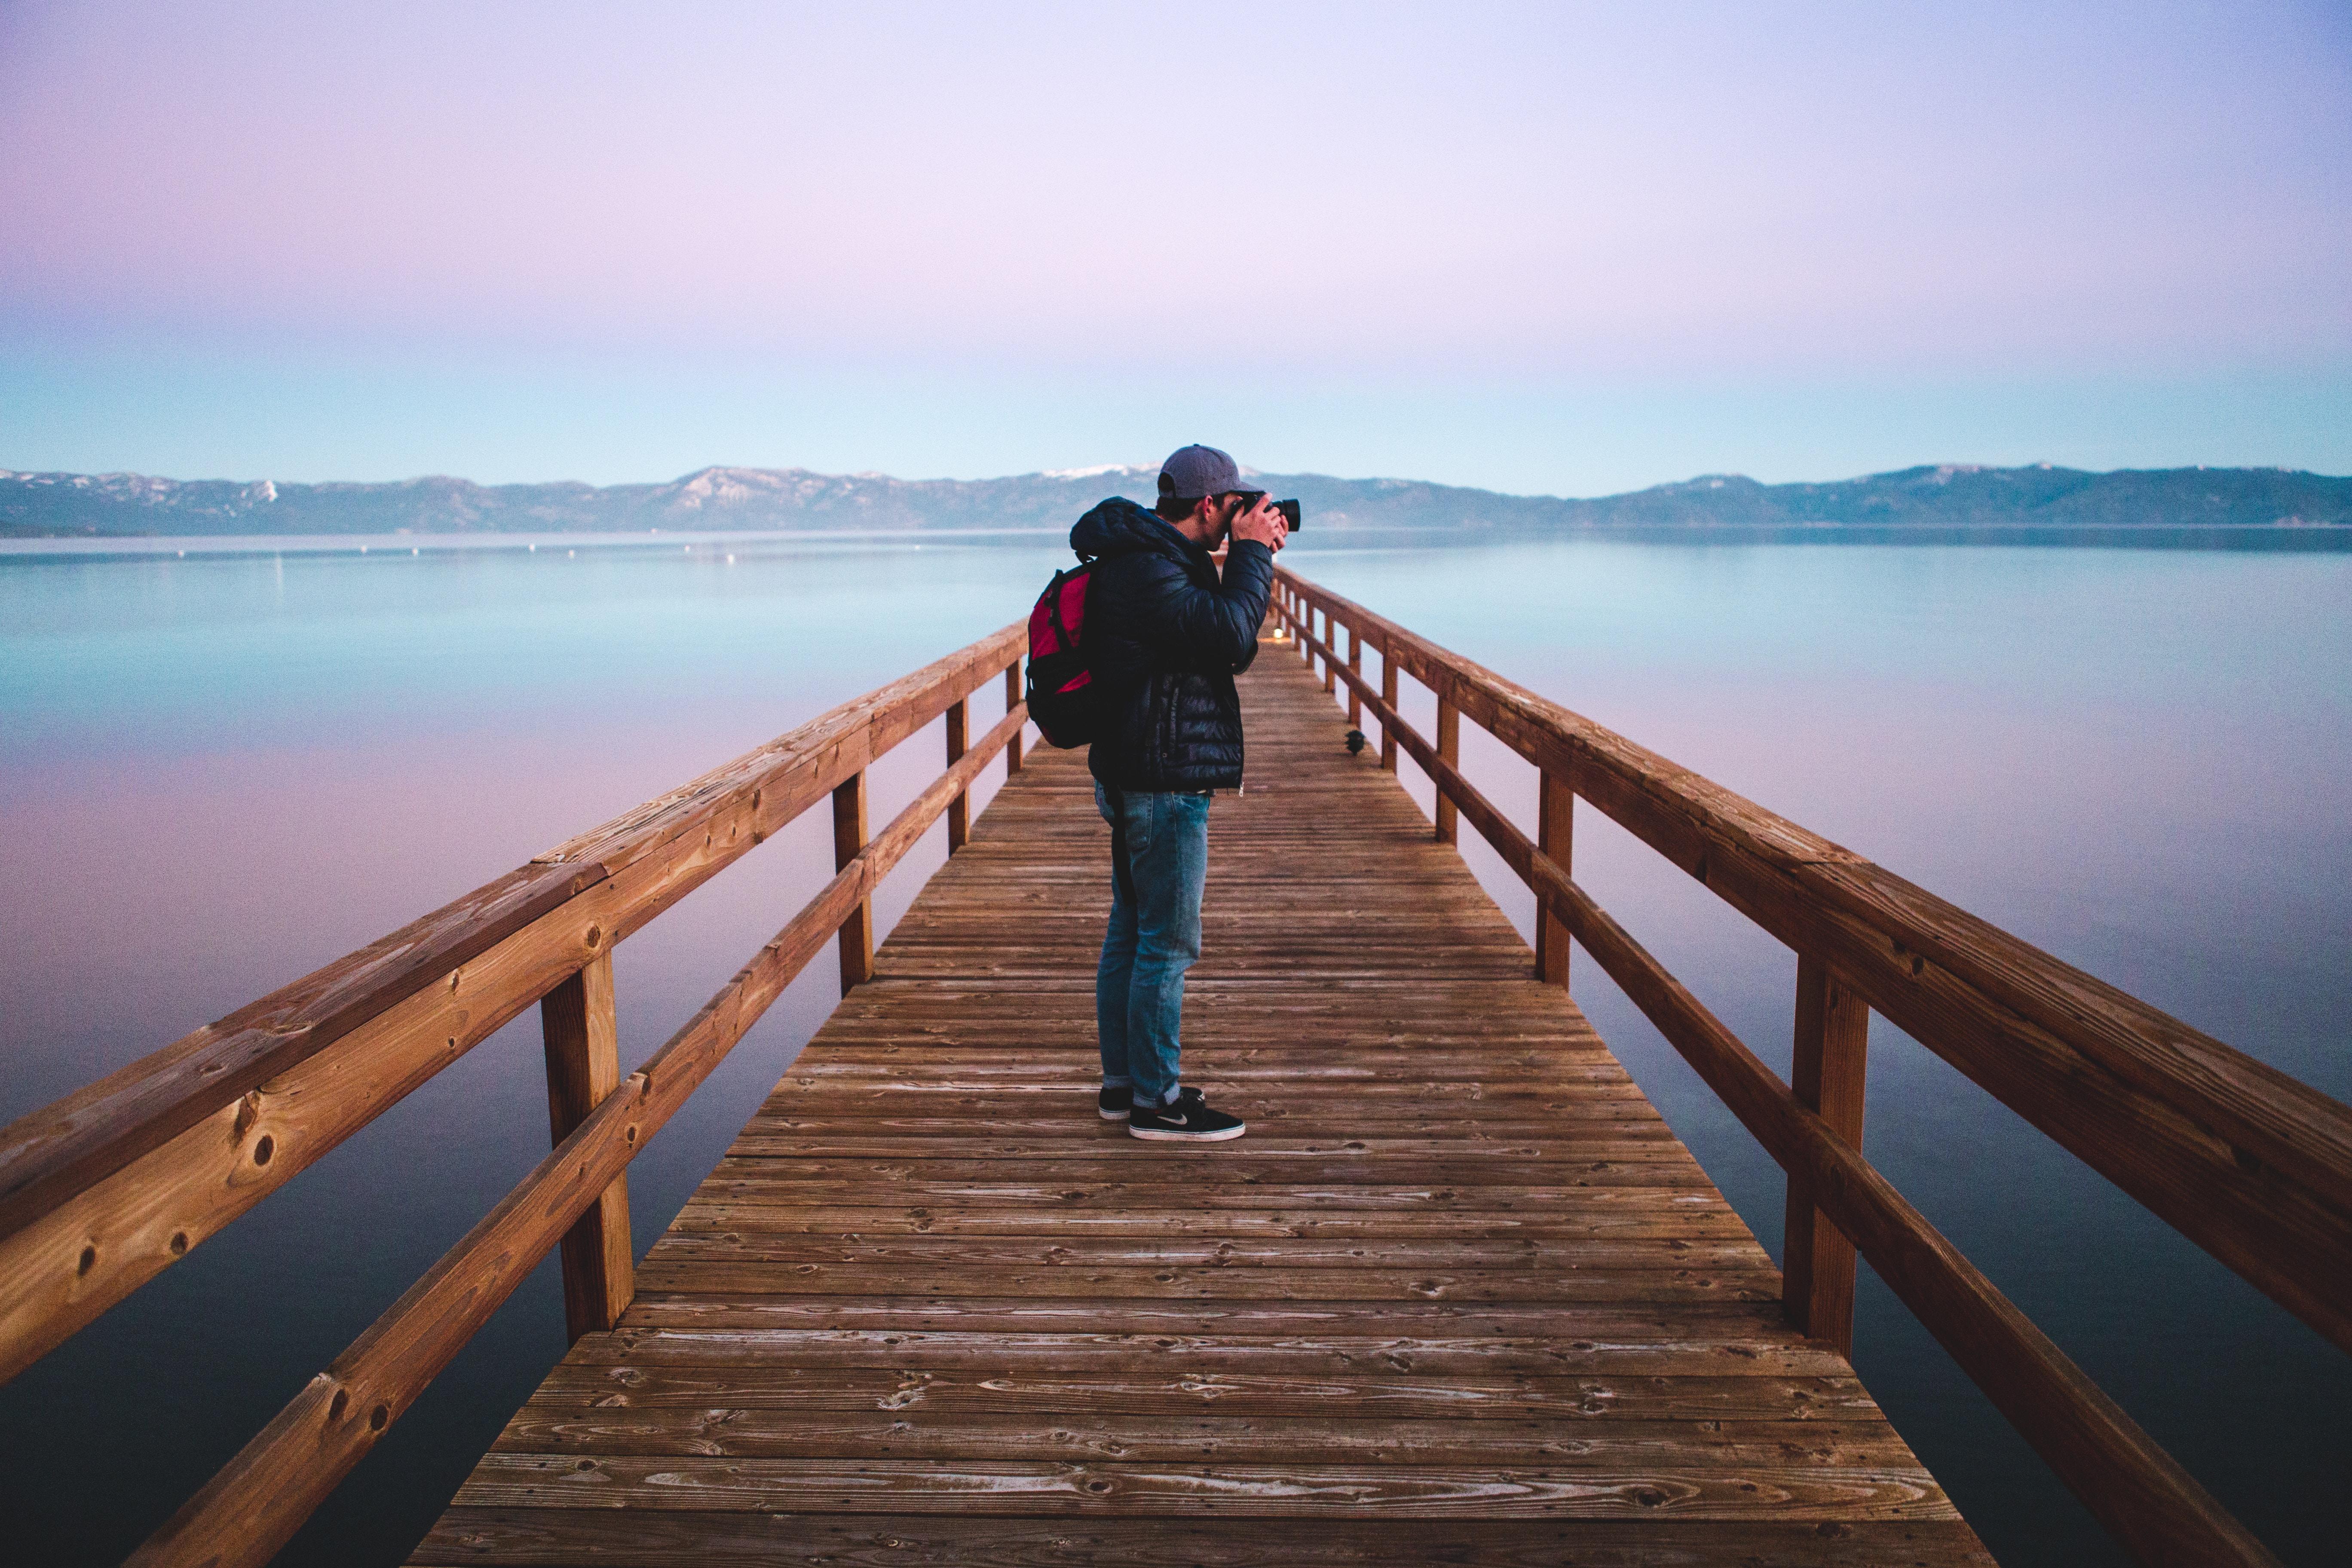 man standing on wood dock taking photo